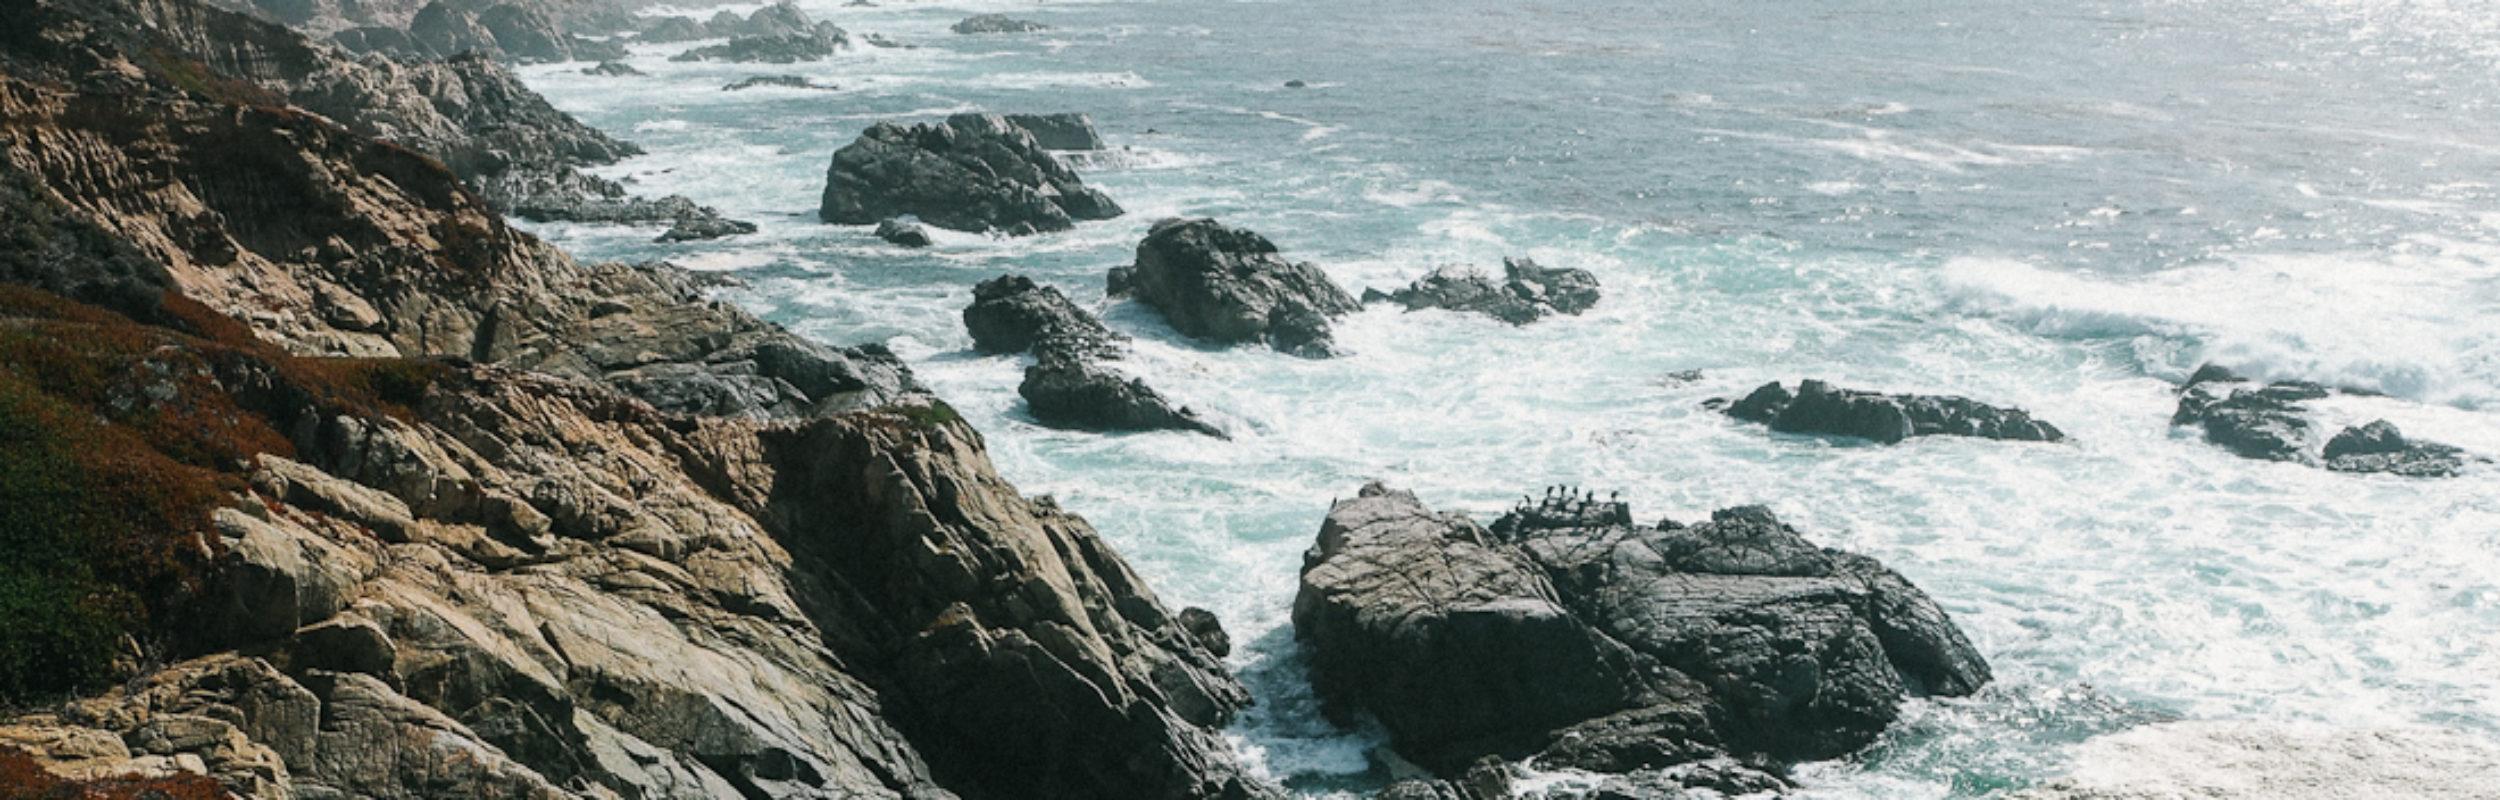 Road-trip en camping-car en Californie : Big Sur et la mythique Highway 1 ! 🌊❤️